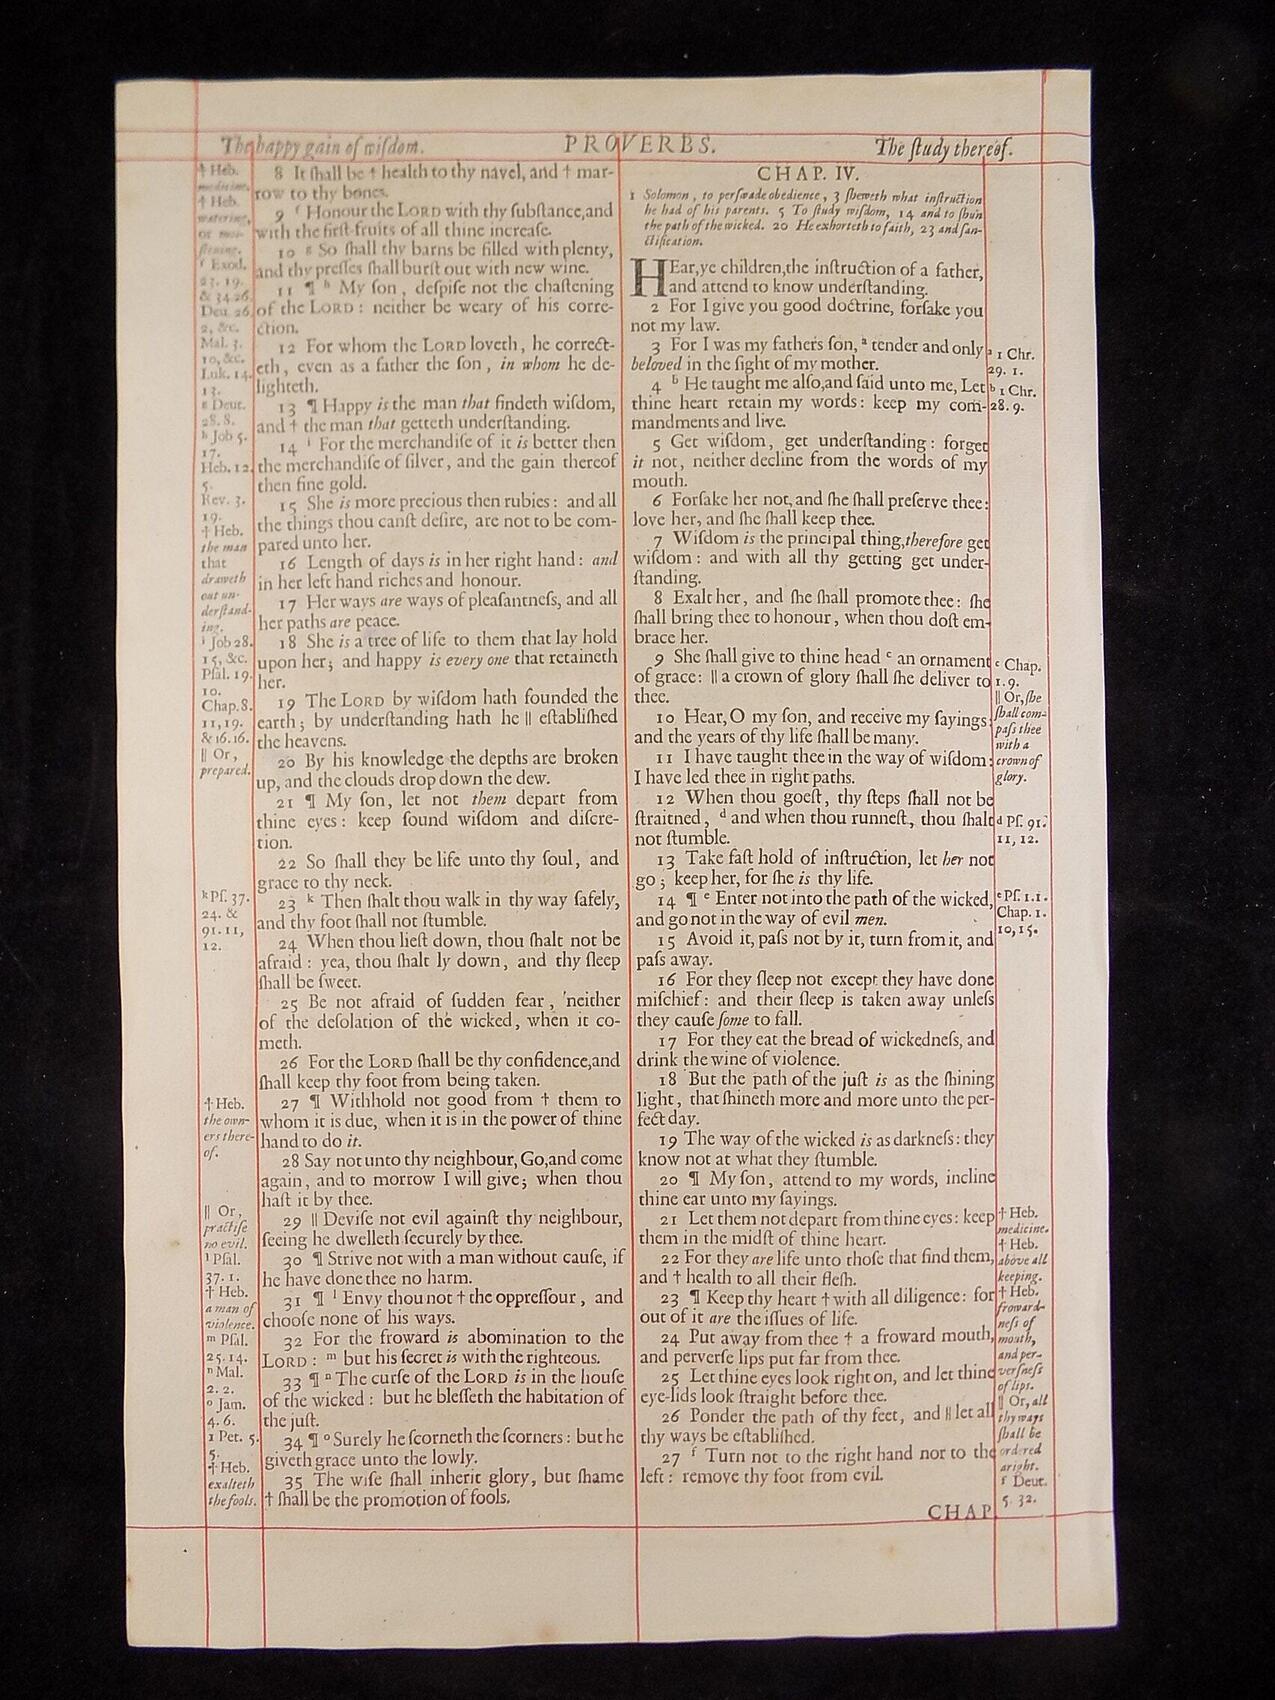 1680 OXFORD KJV PROVERBS LEAVES